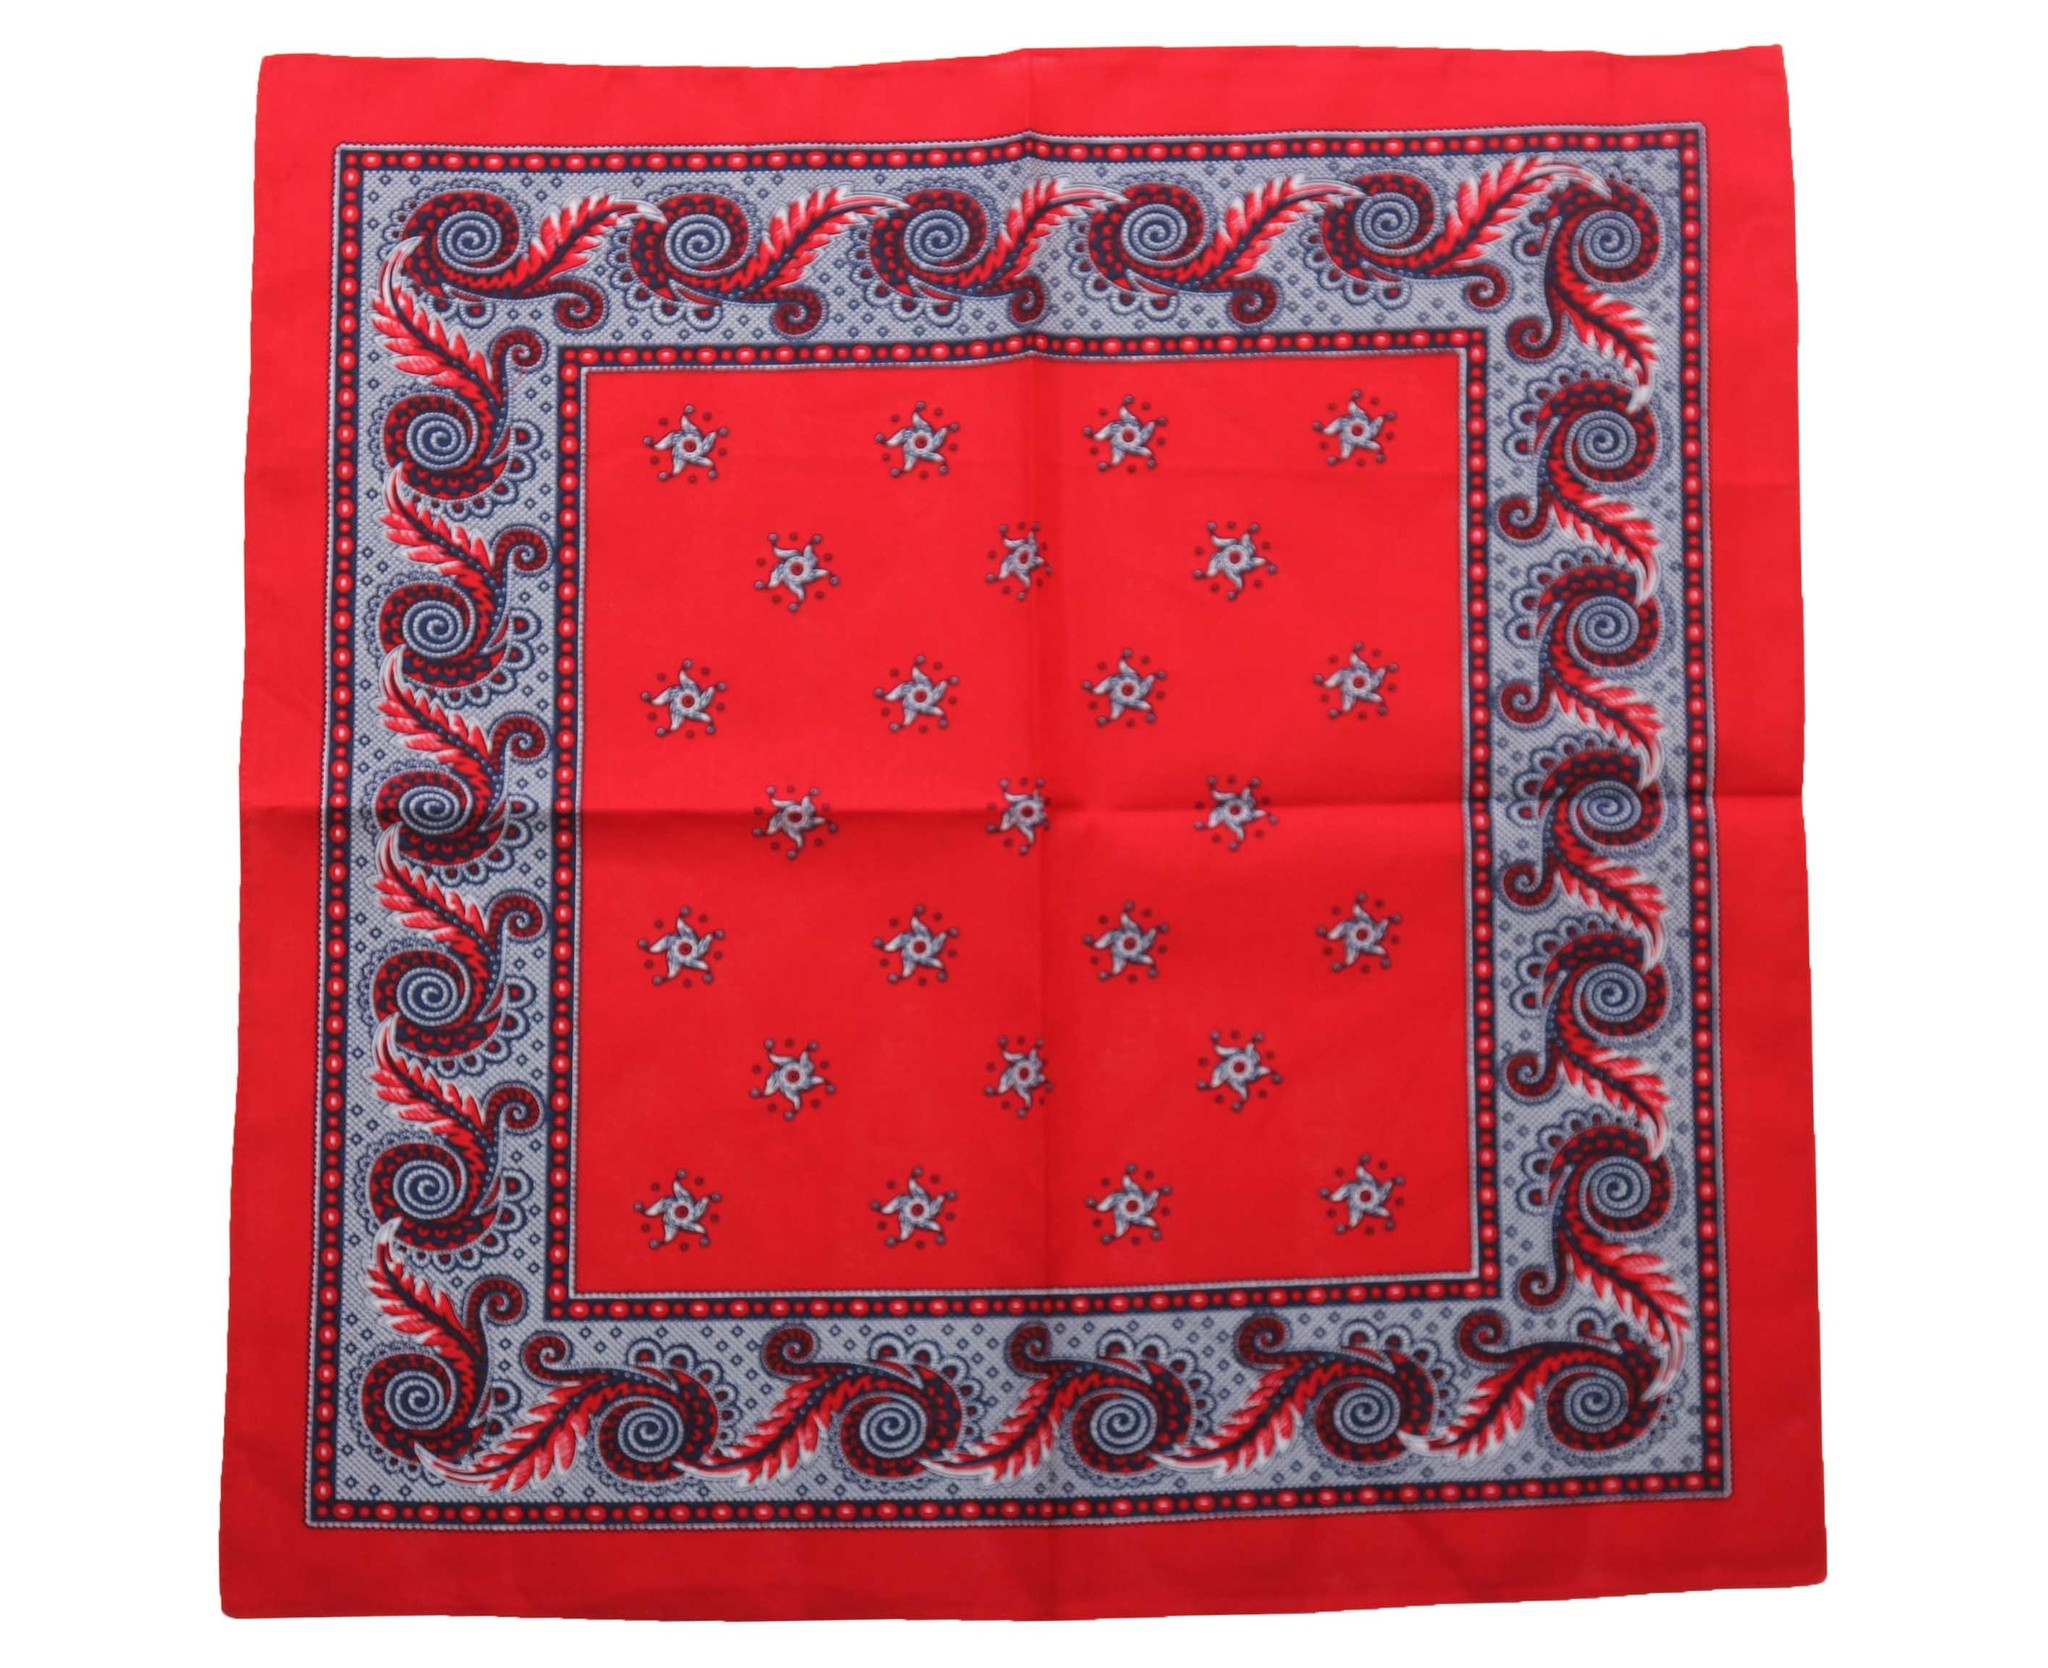 Harlekijn zakdoek rood 55 x 55 cm